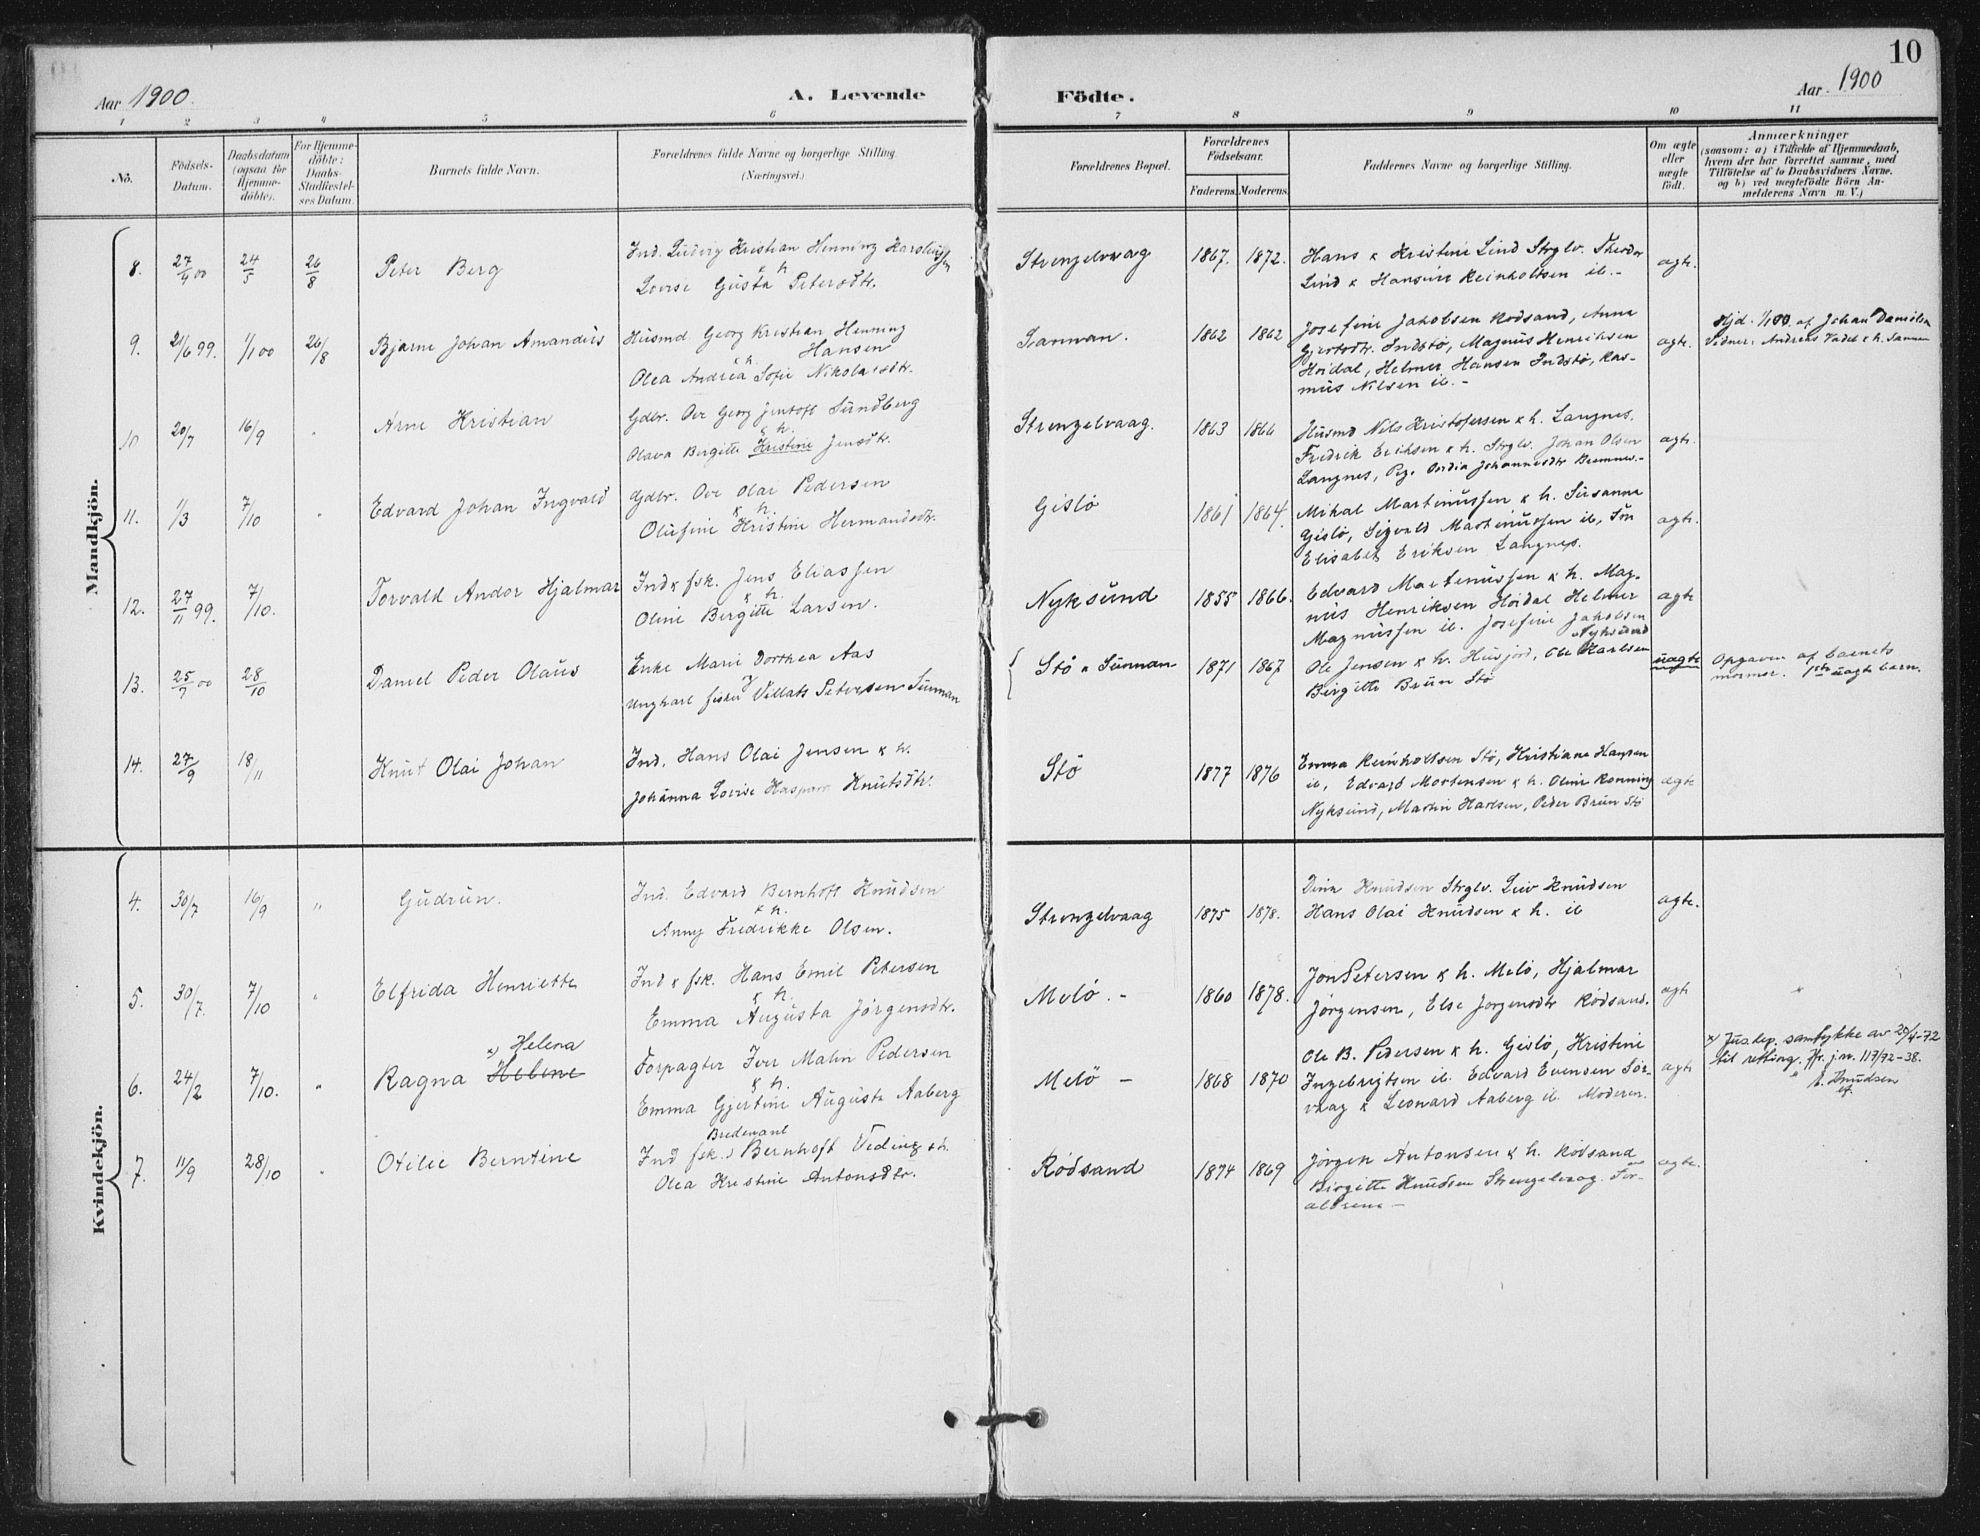 SAT, Ministerialprotokoller, klokkerbøker og fødselsregistre - Nordland, 894/L1356: Ministerialbok nr. 894A02, 1897-1914, s. 10